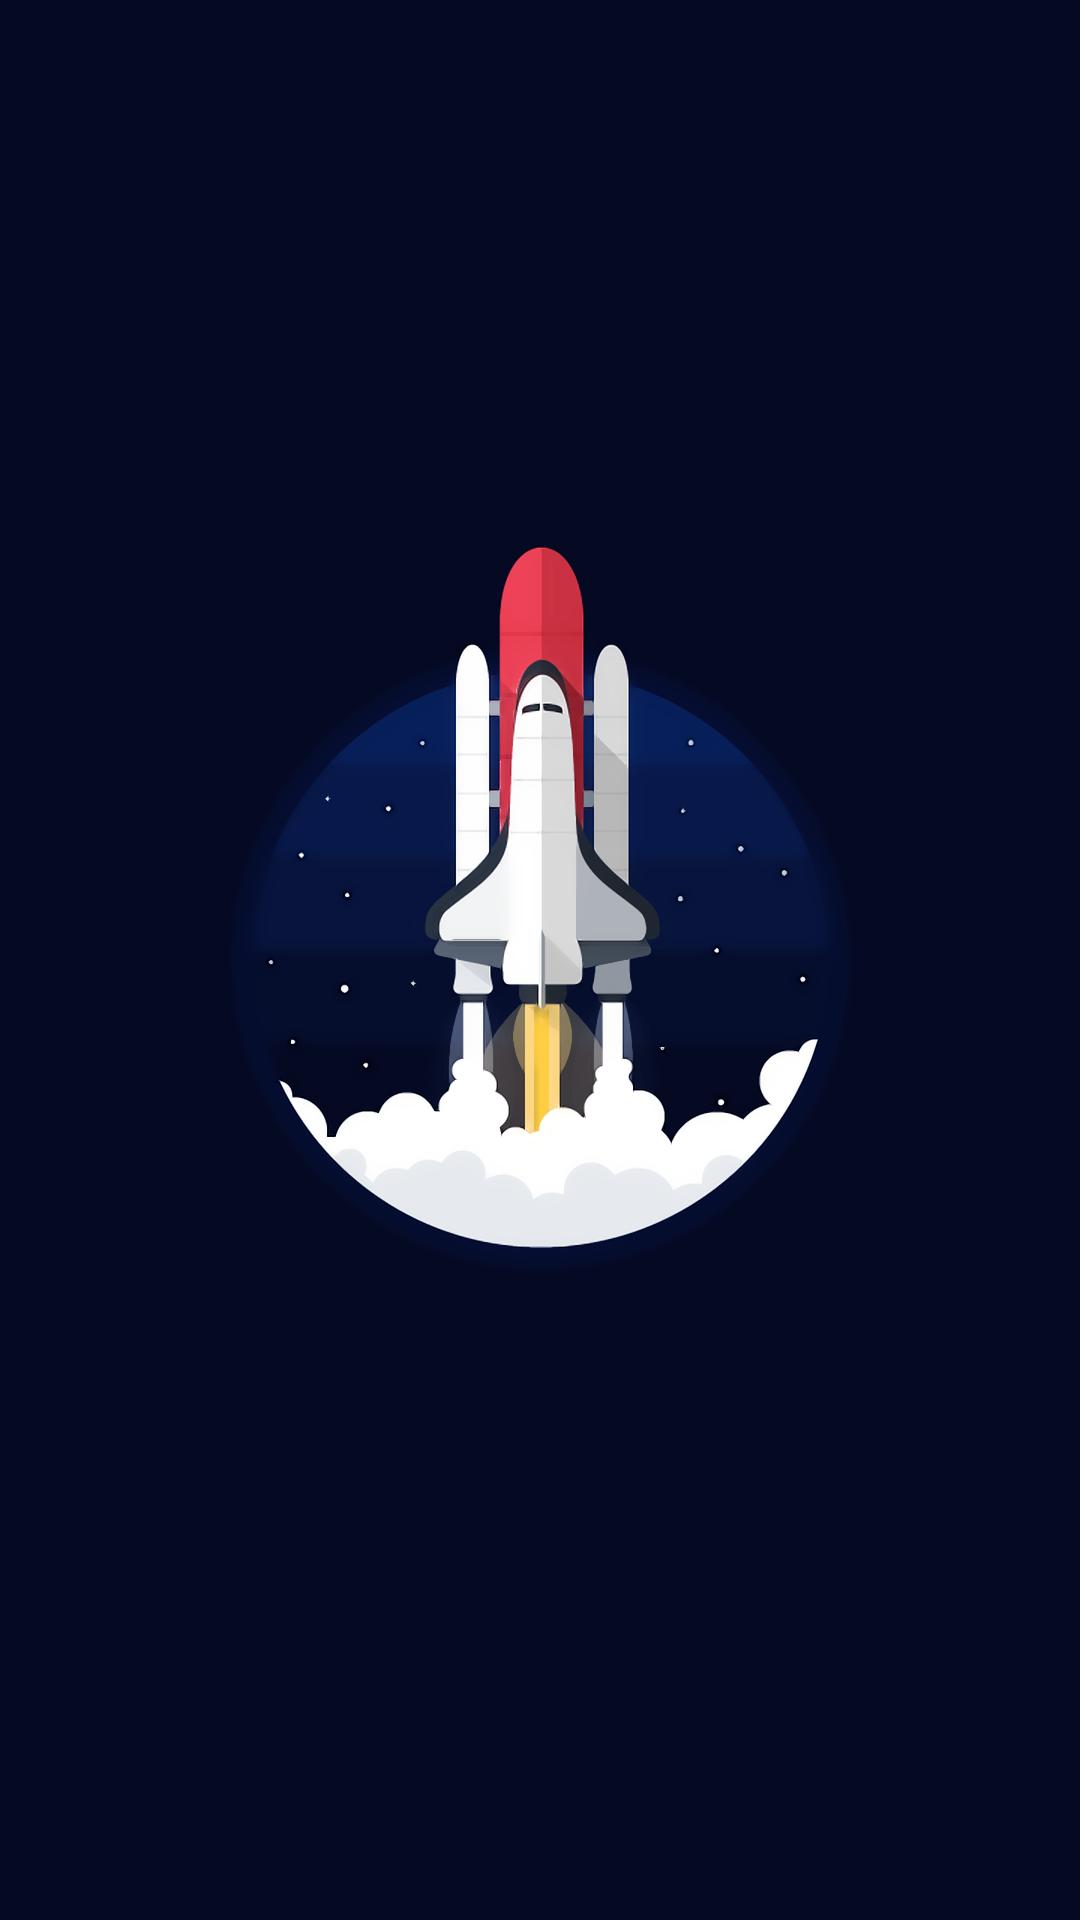 General 1080x1920 digital art portrait display rocket spaceship simple background minimalism blue background space shuttle